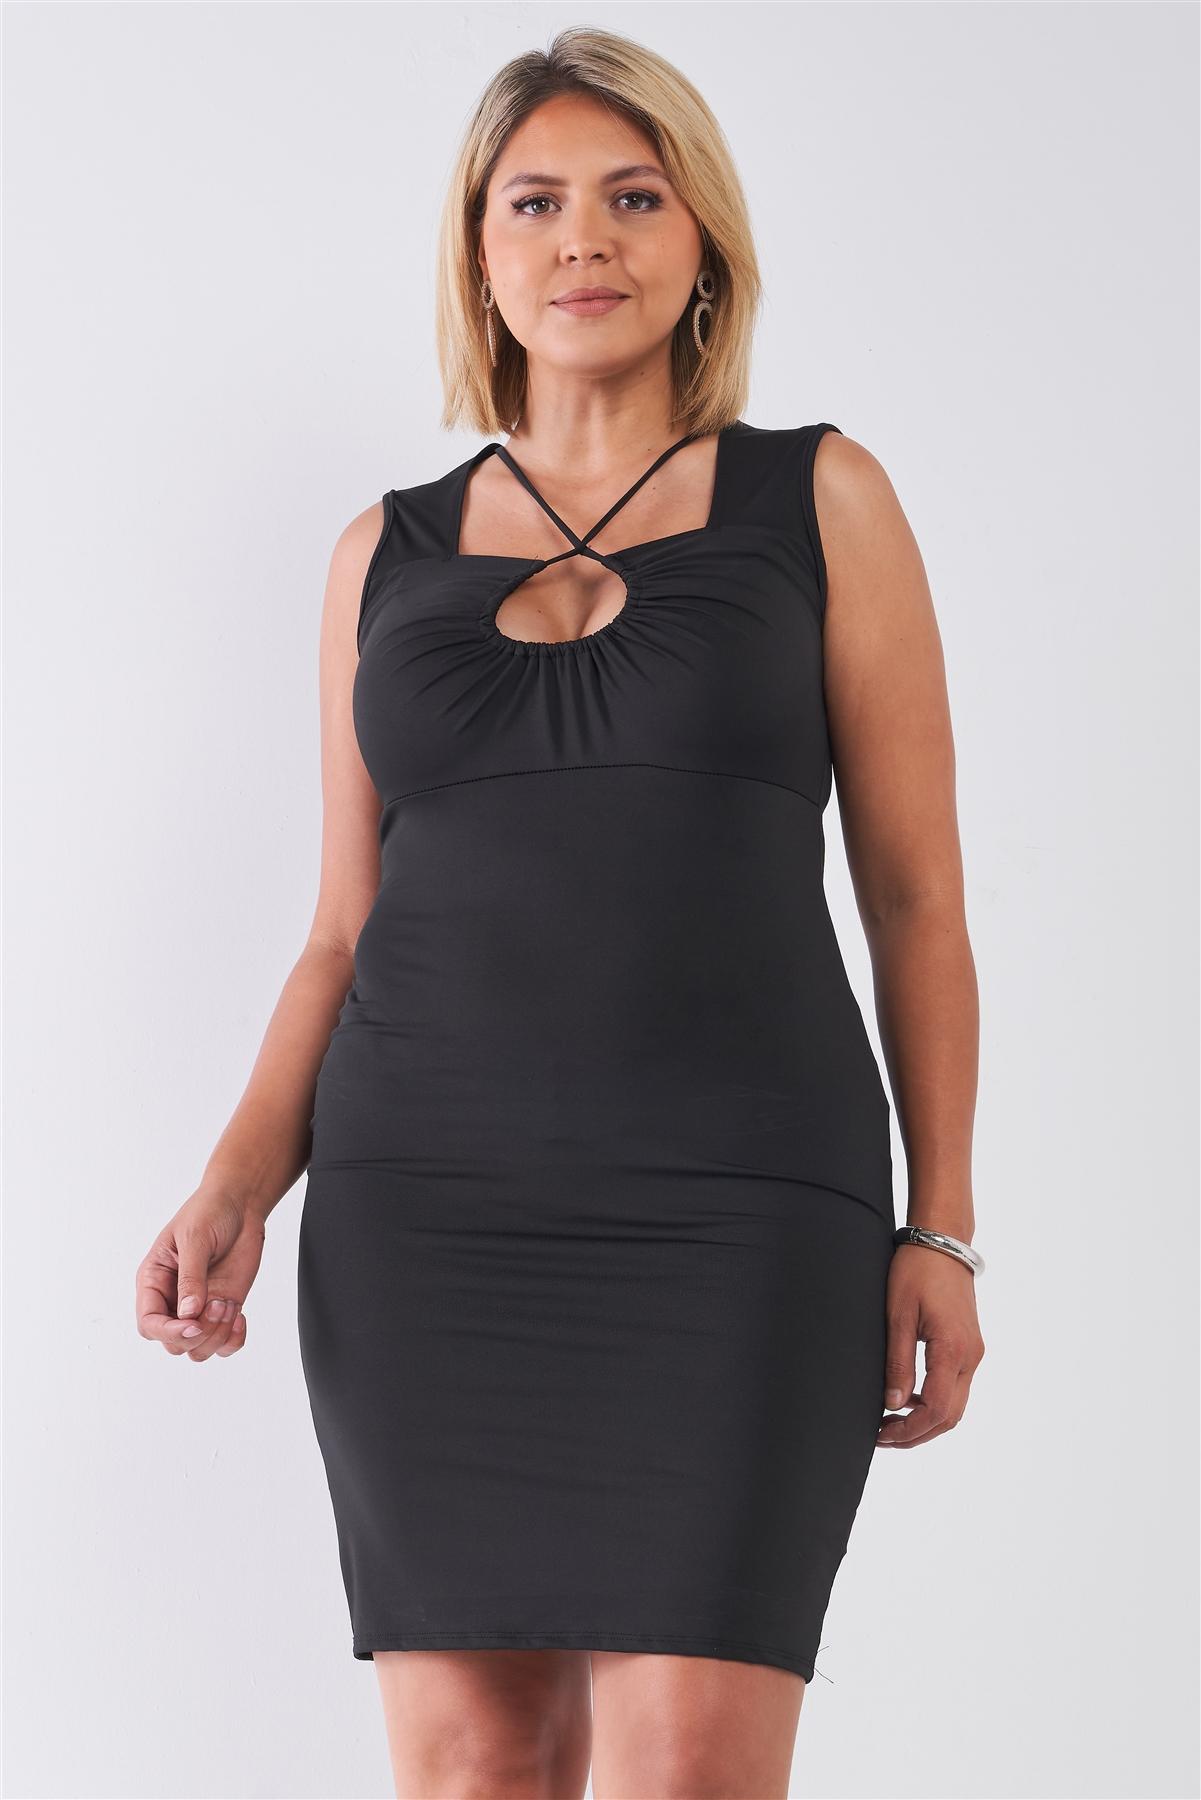 Black Plus Size Strappy Plunge Bodycon Dress / 2-2-2